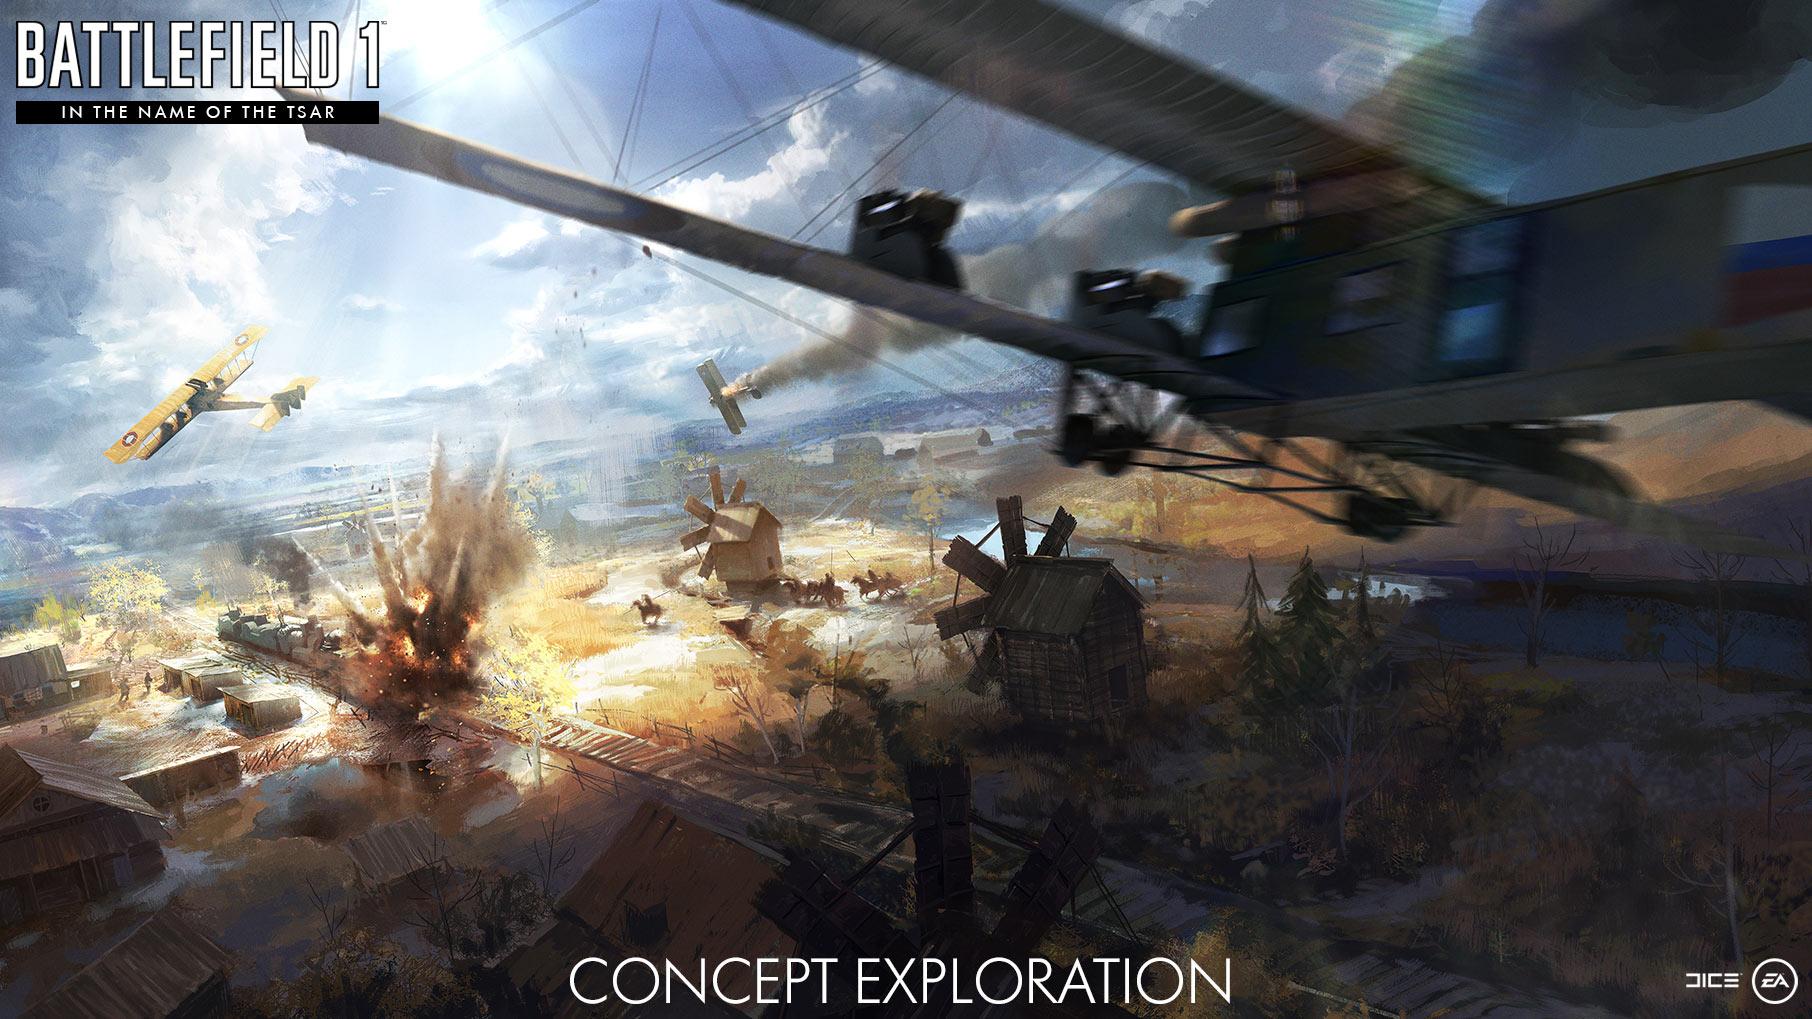 Battlefield 1 tsar In the name of the Tsar